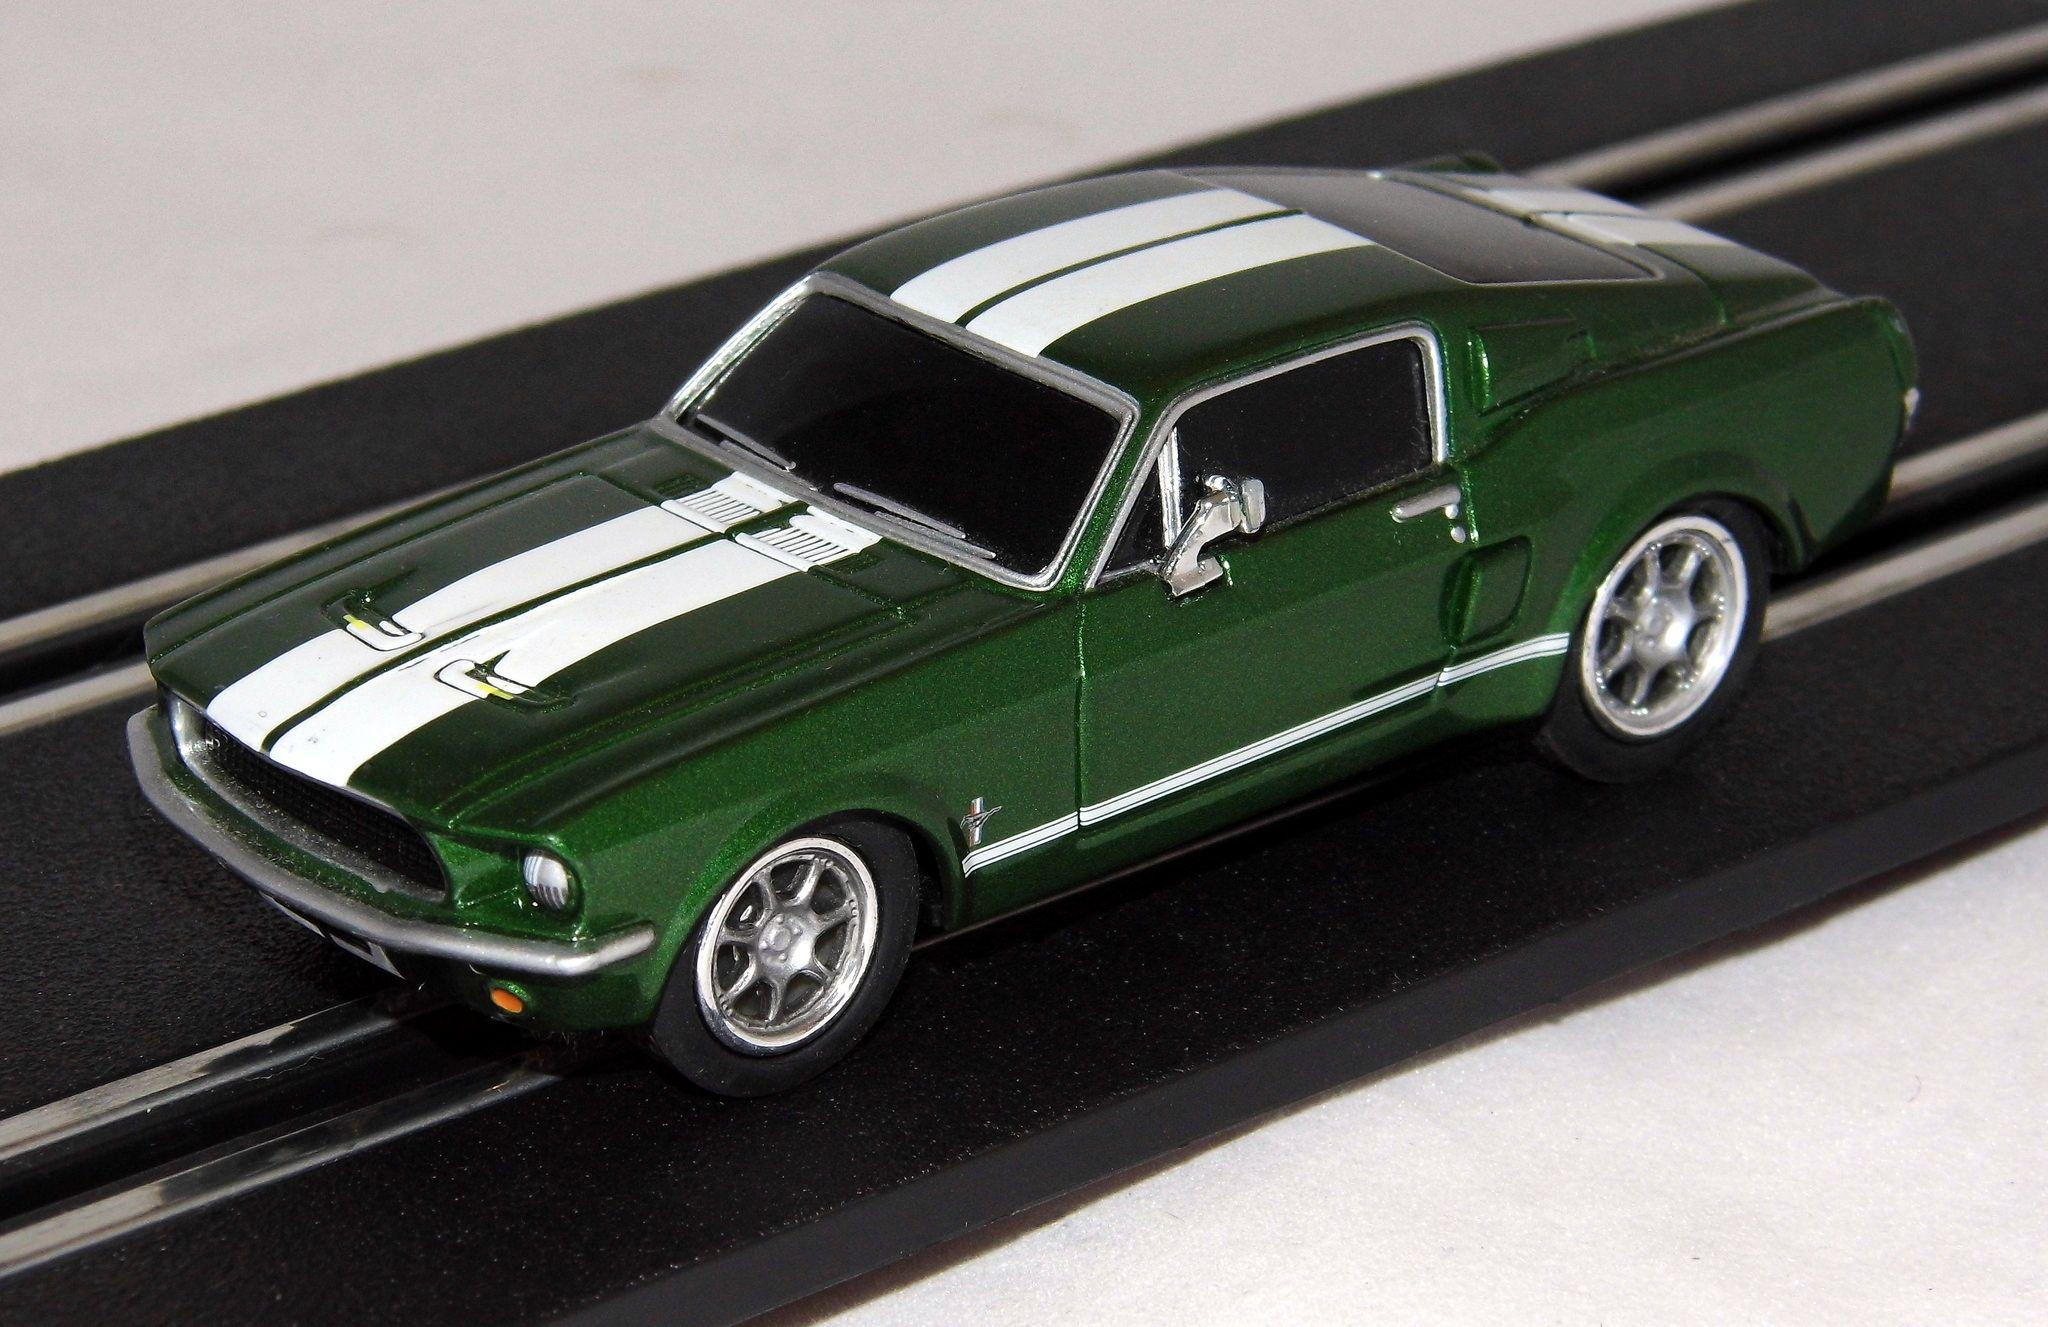 Ford Mustang Carrera Go Slot Car 1 43 Scale Slot Cars Ford Mustang Slot Car Racing